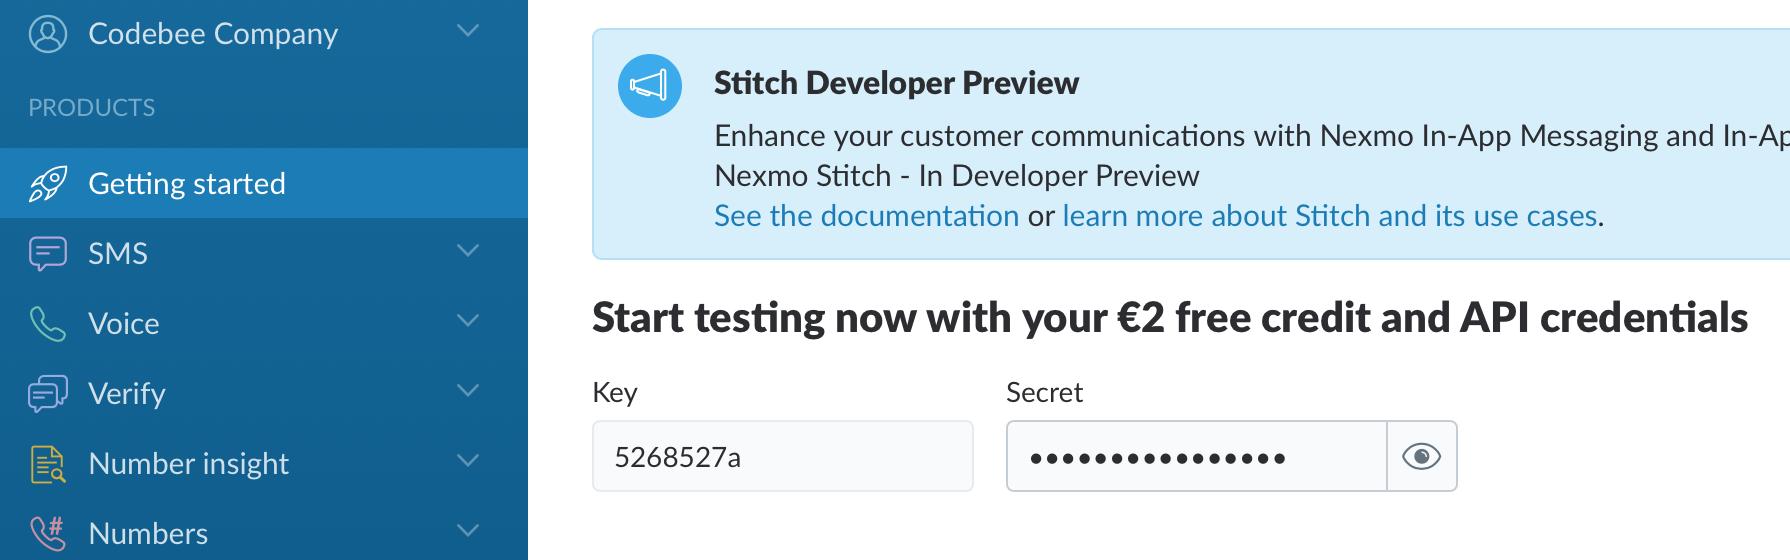 PHP-ส่งข้อความเข้ามือถือ